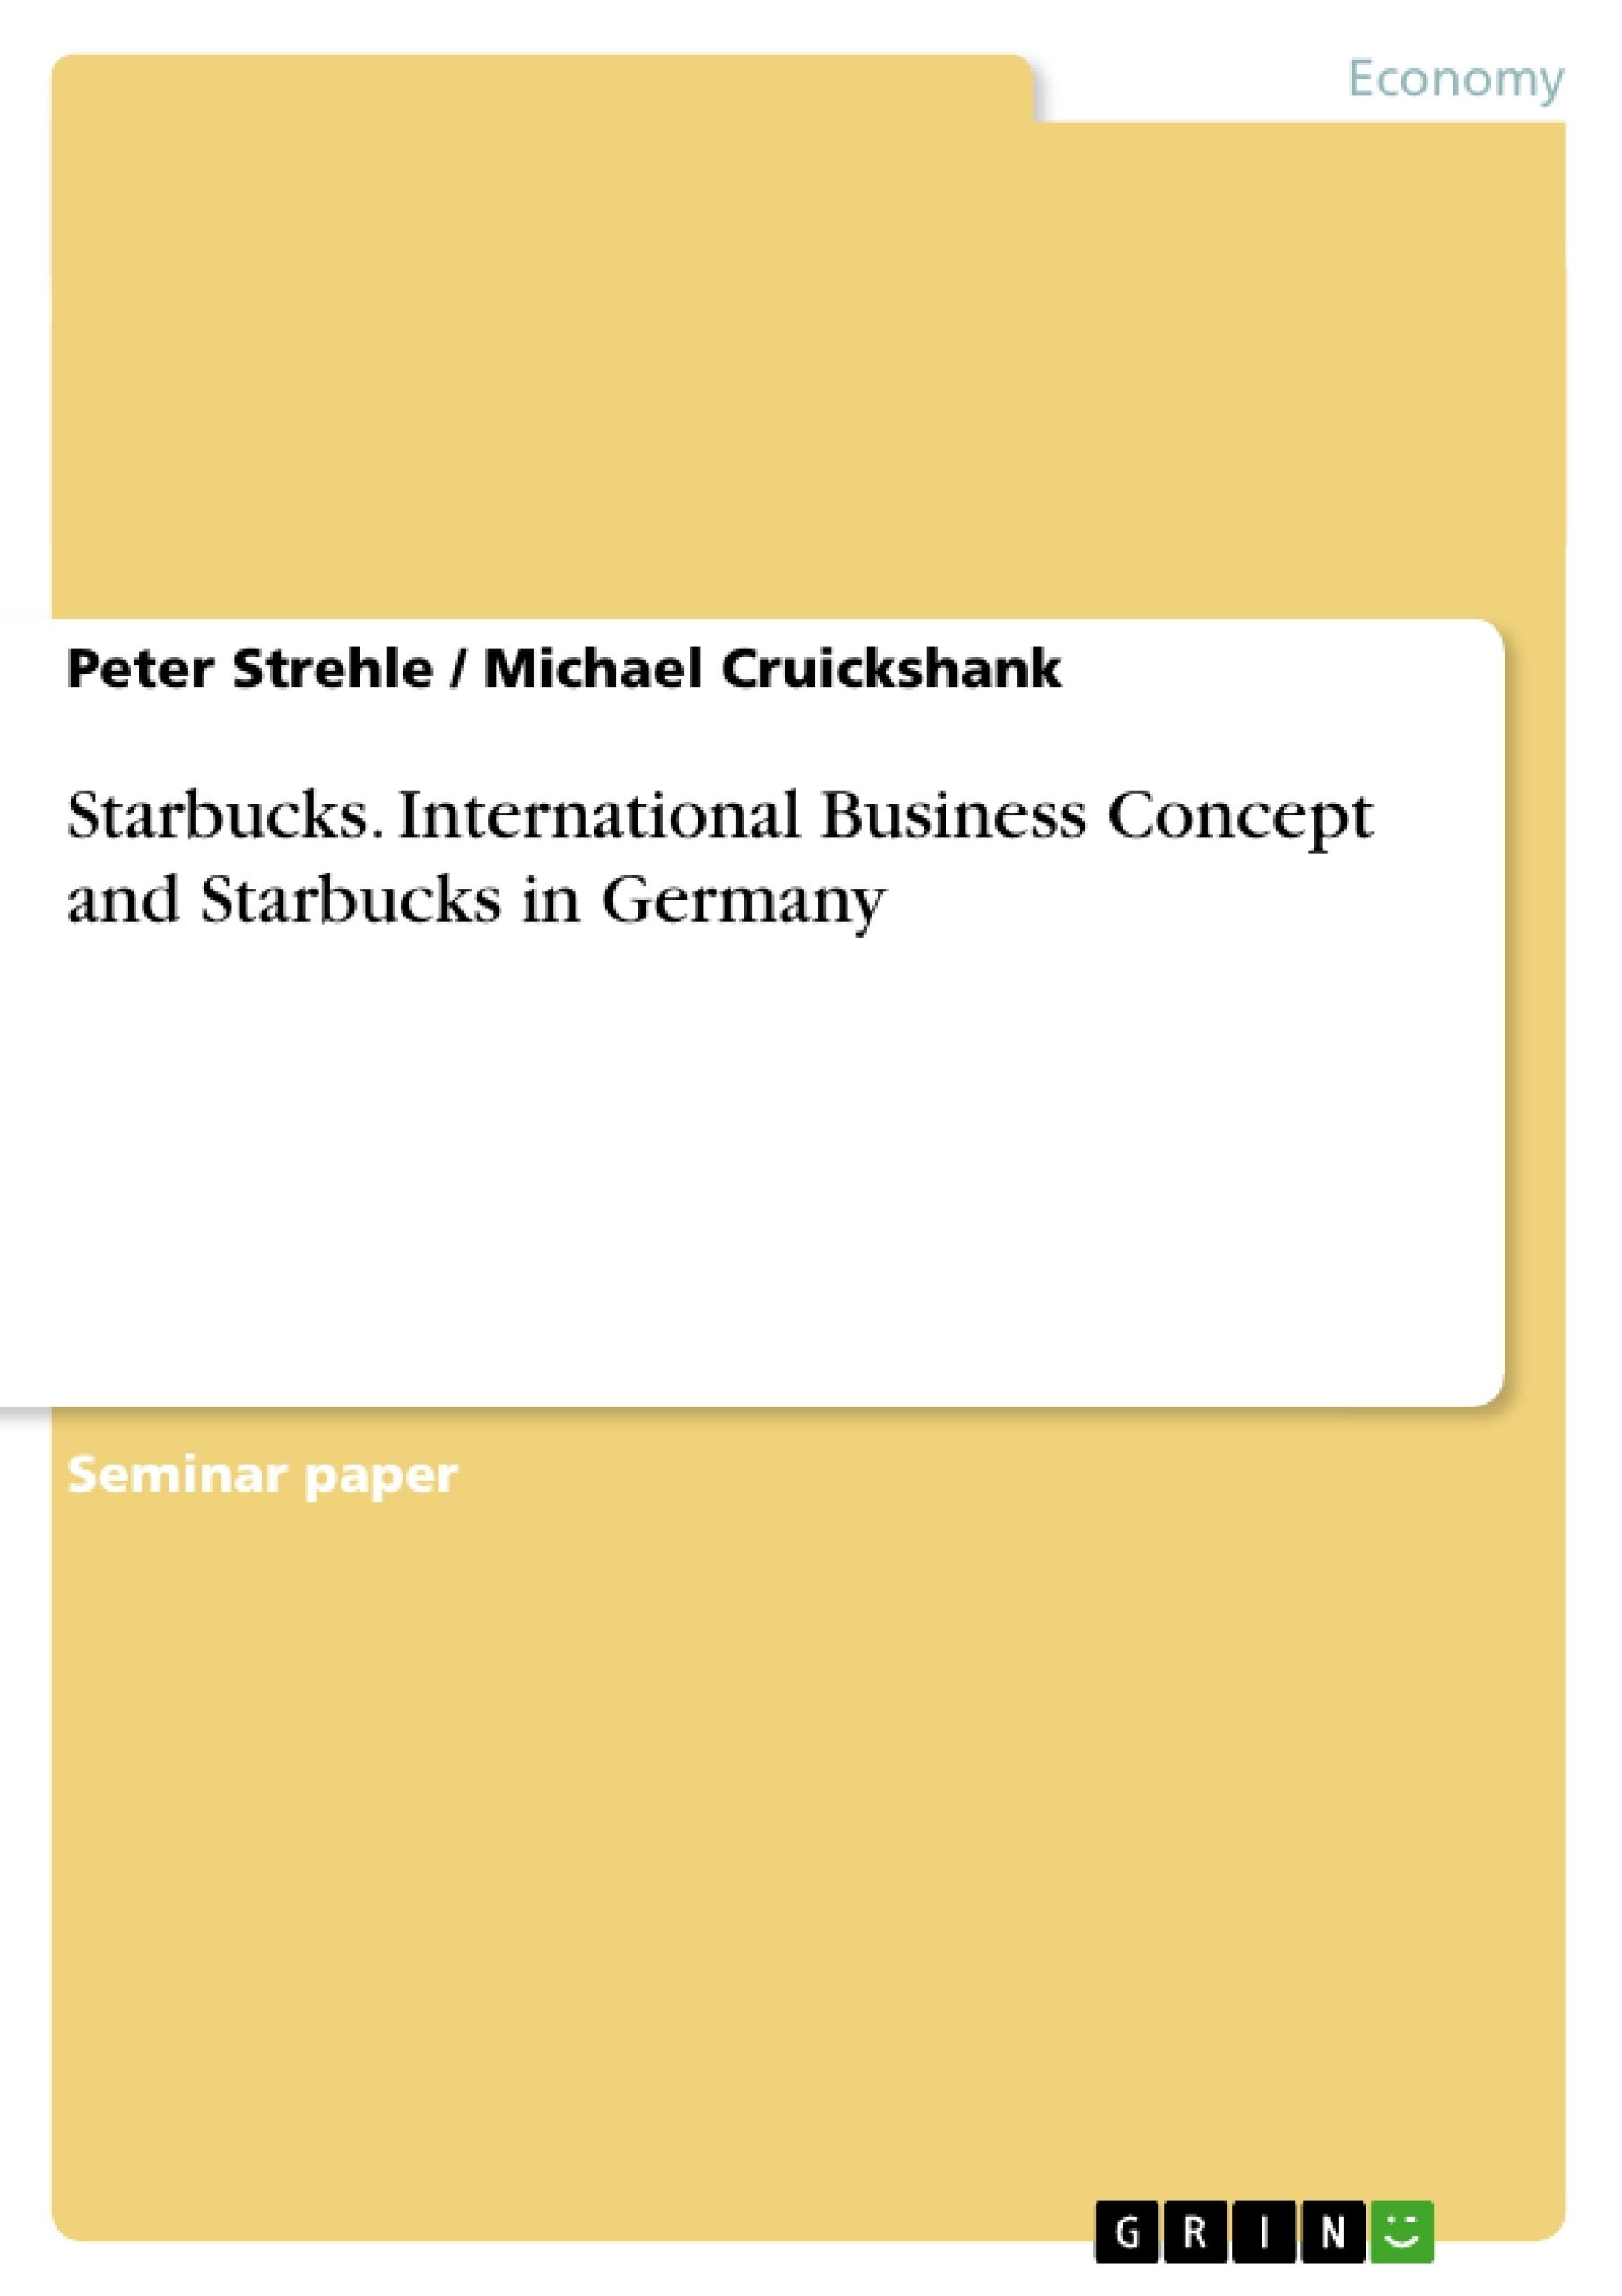 Thesis Of Starbucks Free Essays